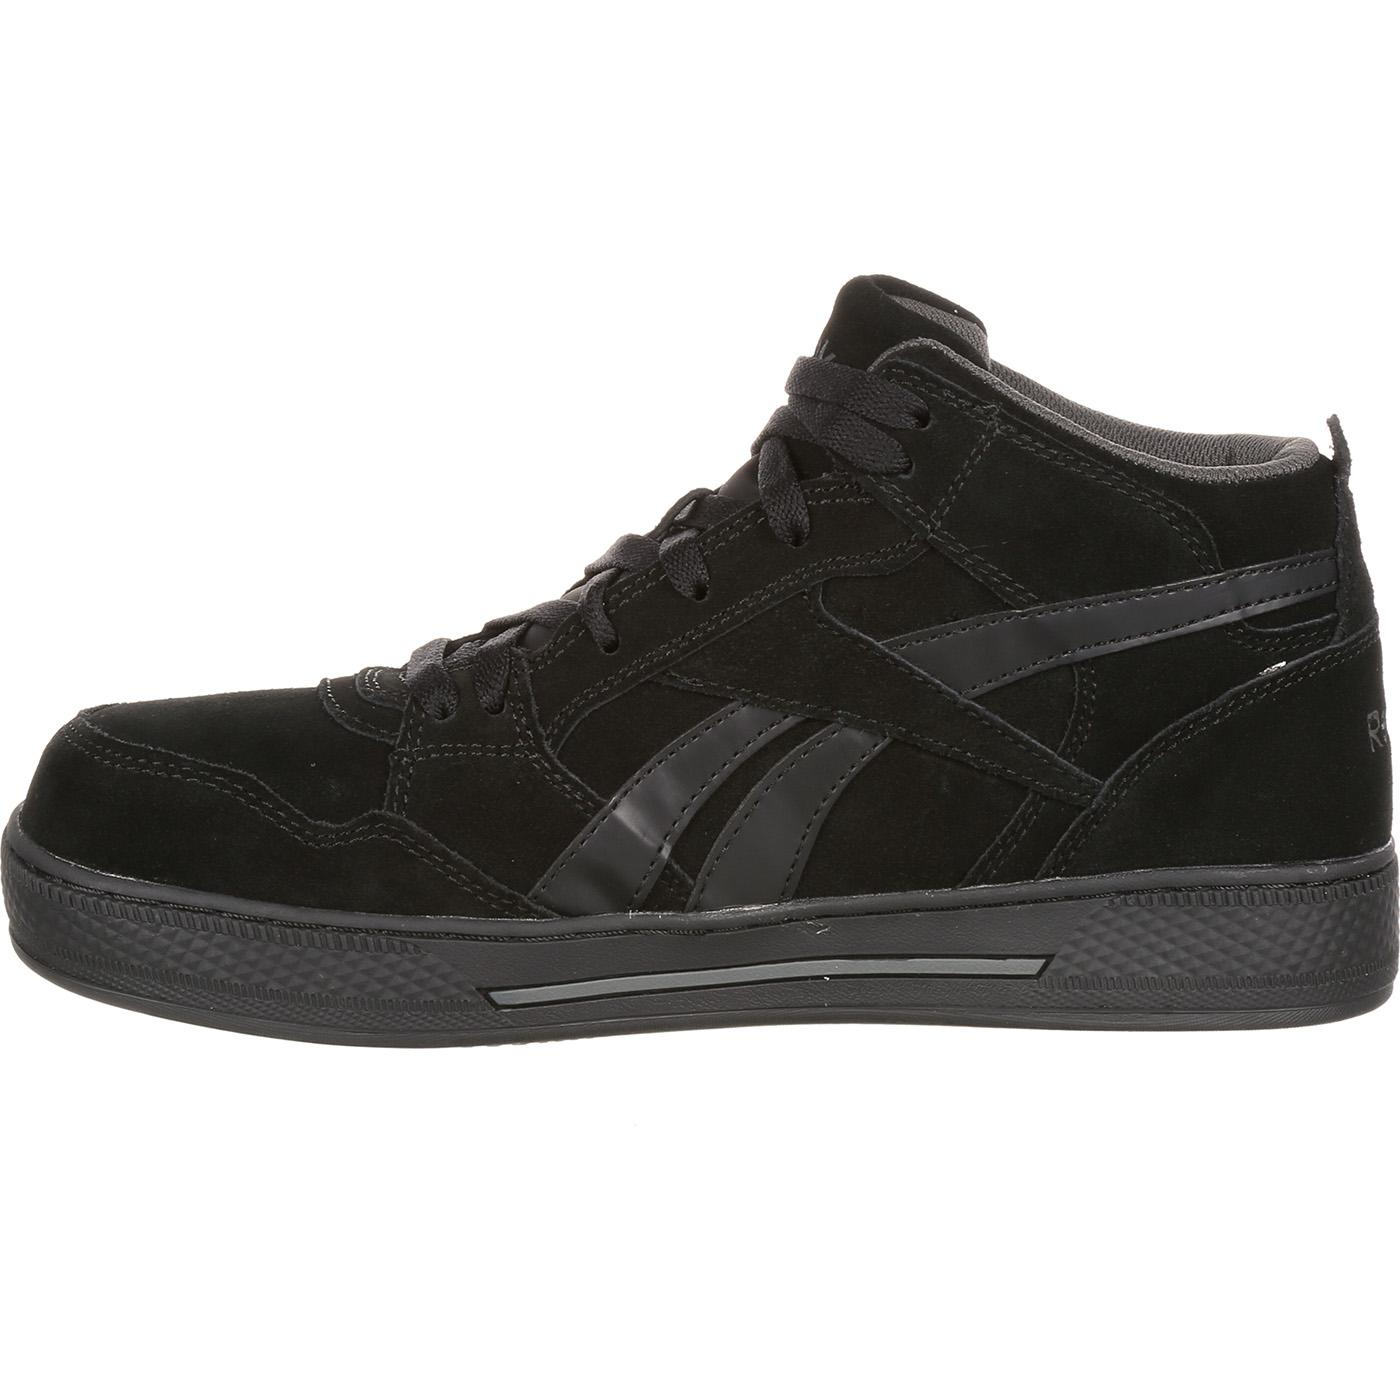 9c9ad4f72cf4 Reebok Composite Toe MidHi Skate Work Shoe